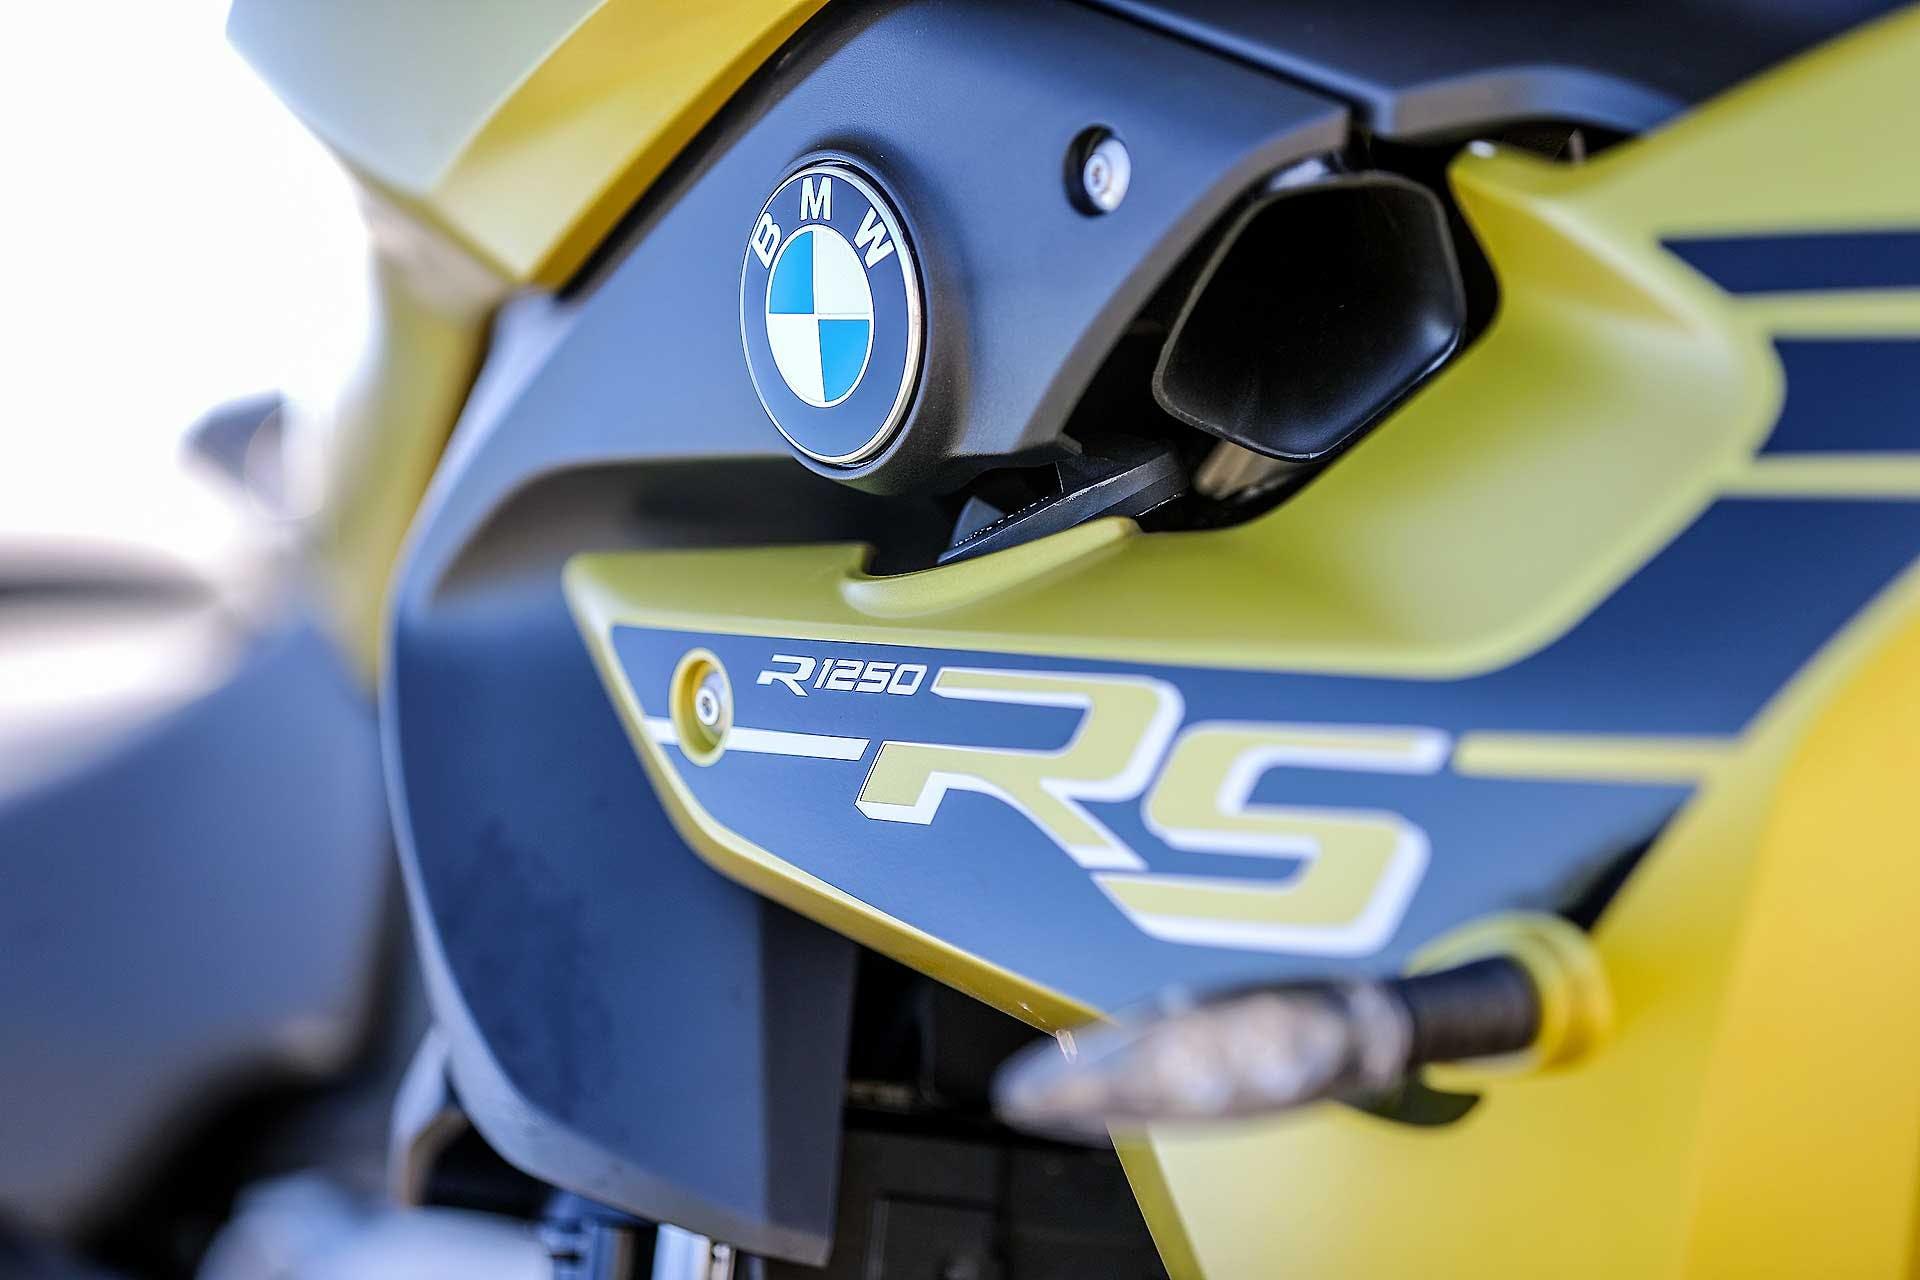 BMW R 1250 RS 2020 particolare logo RS